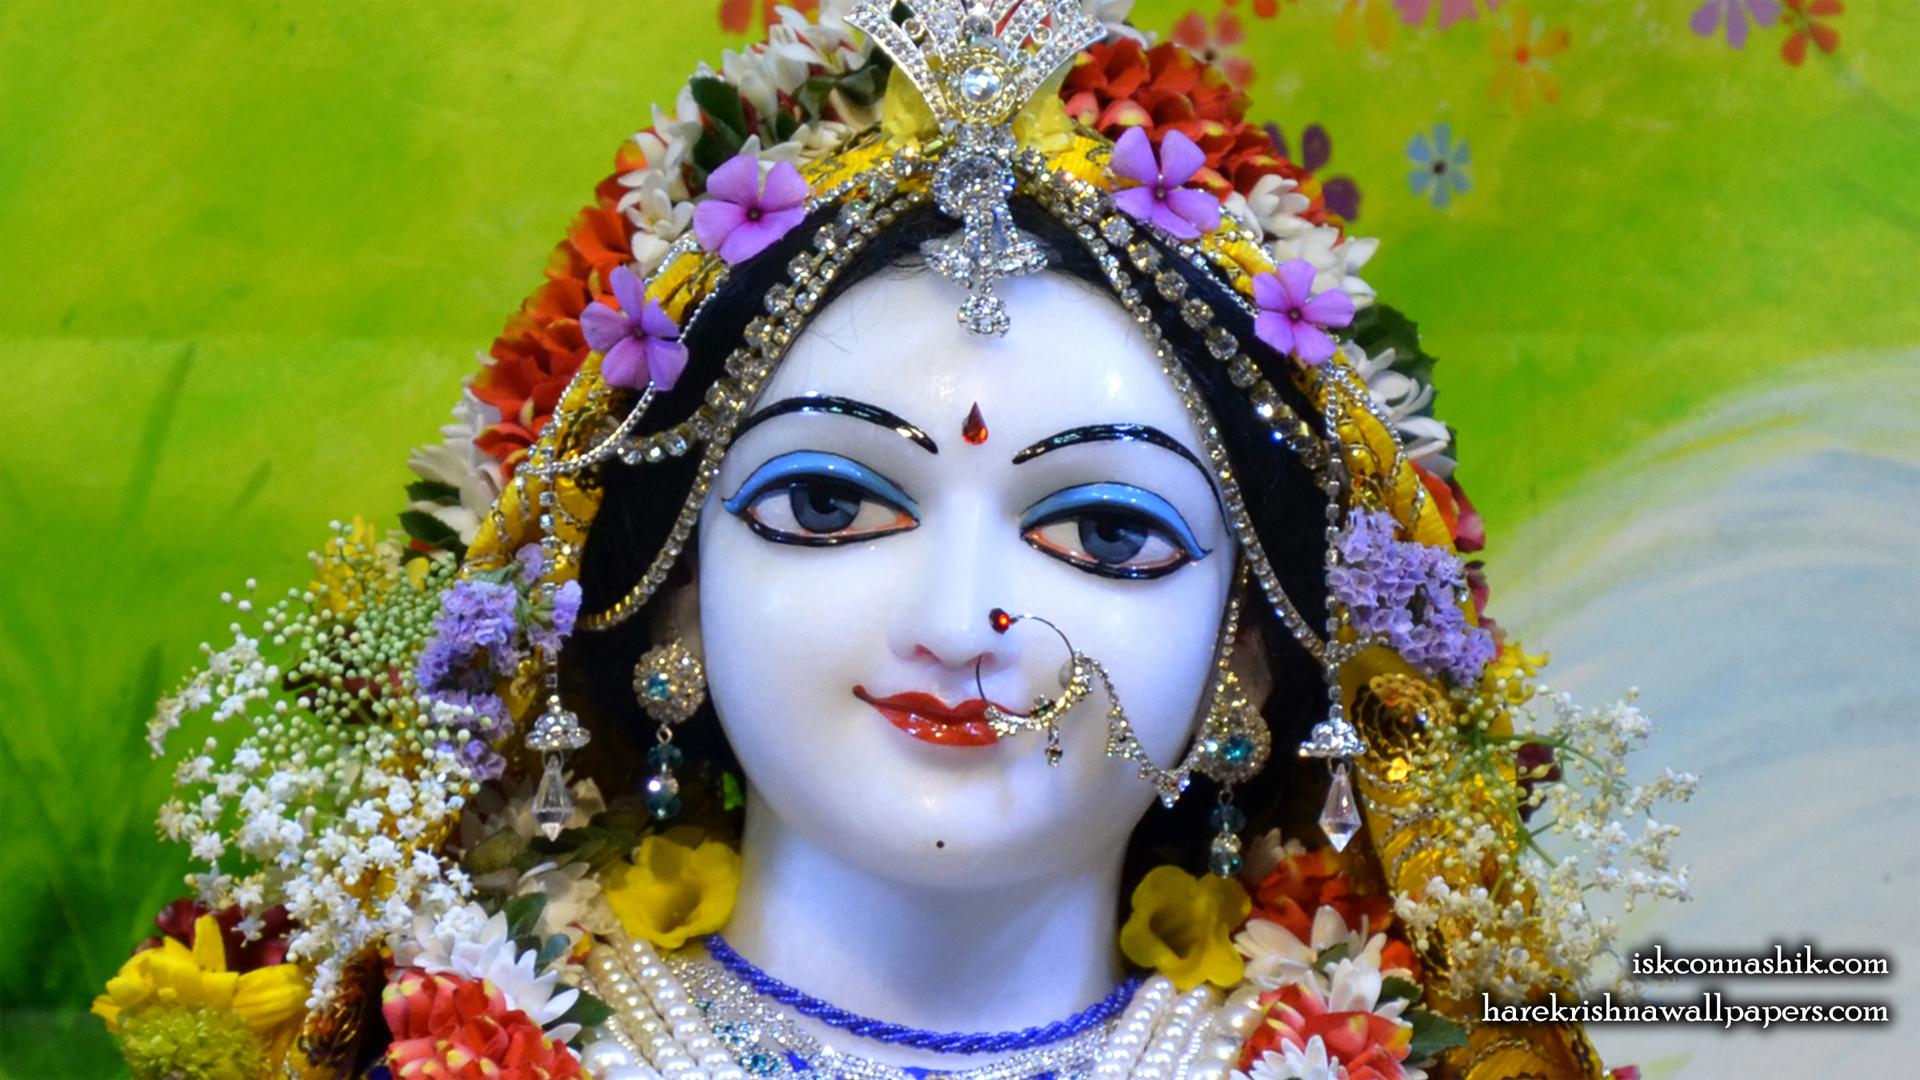 Sri Radha Close up Wallpaper (006) Size 1920x1080 Download